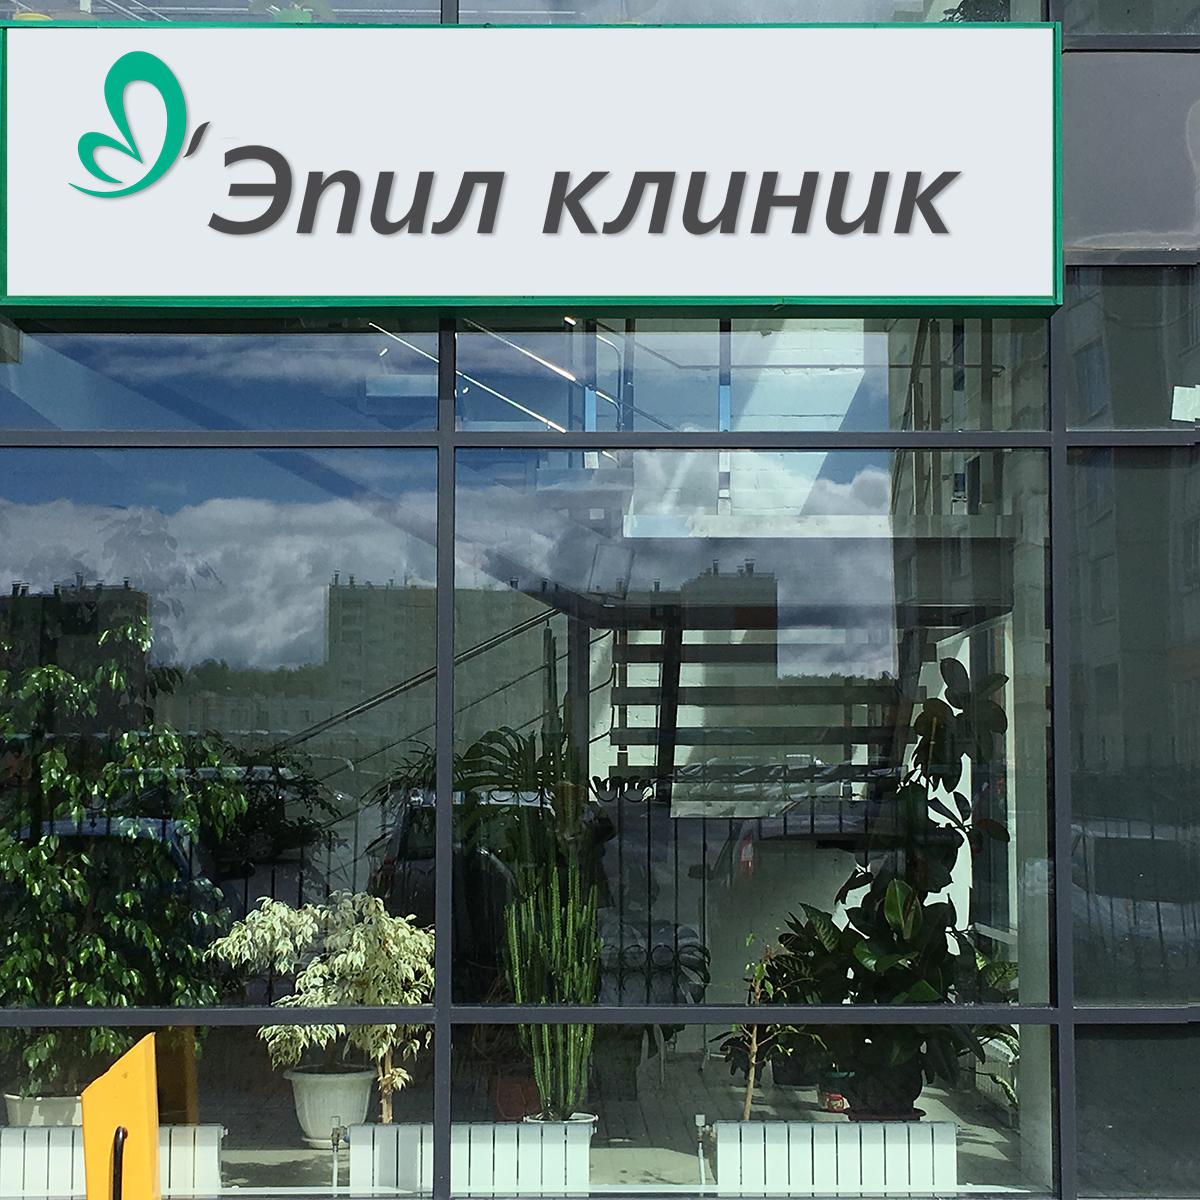 Логотип , фирменный стиль  фото f_9115e1efc6f3c4d5.jpg